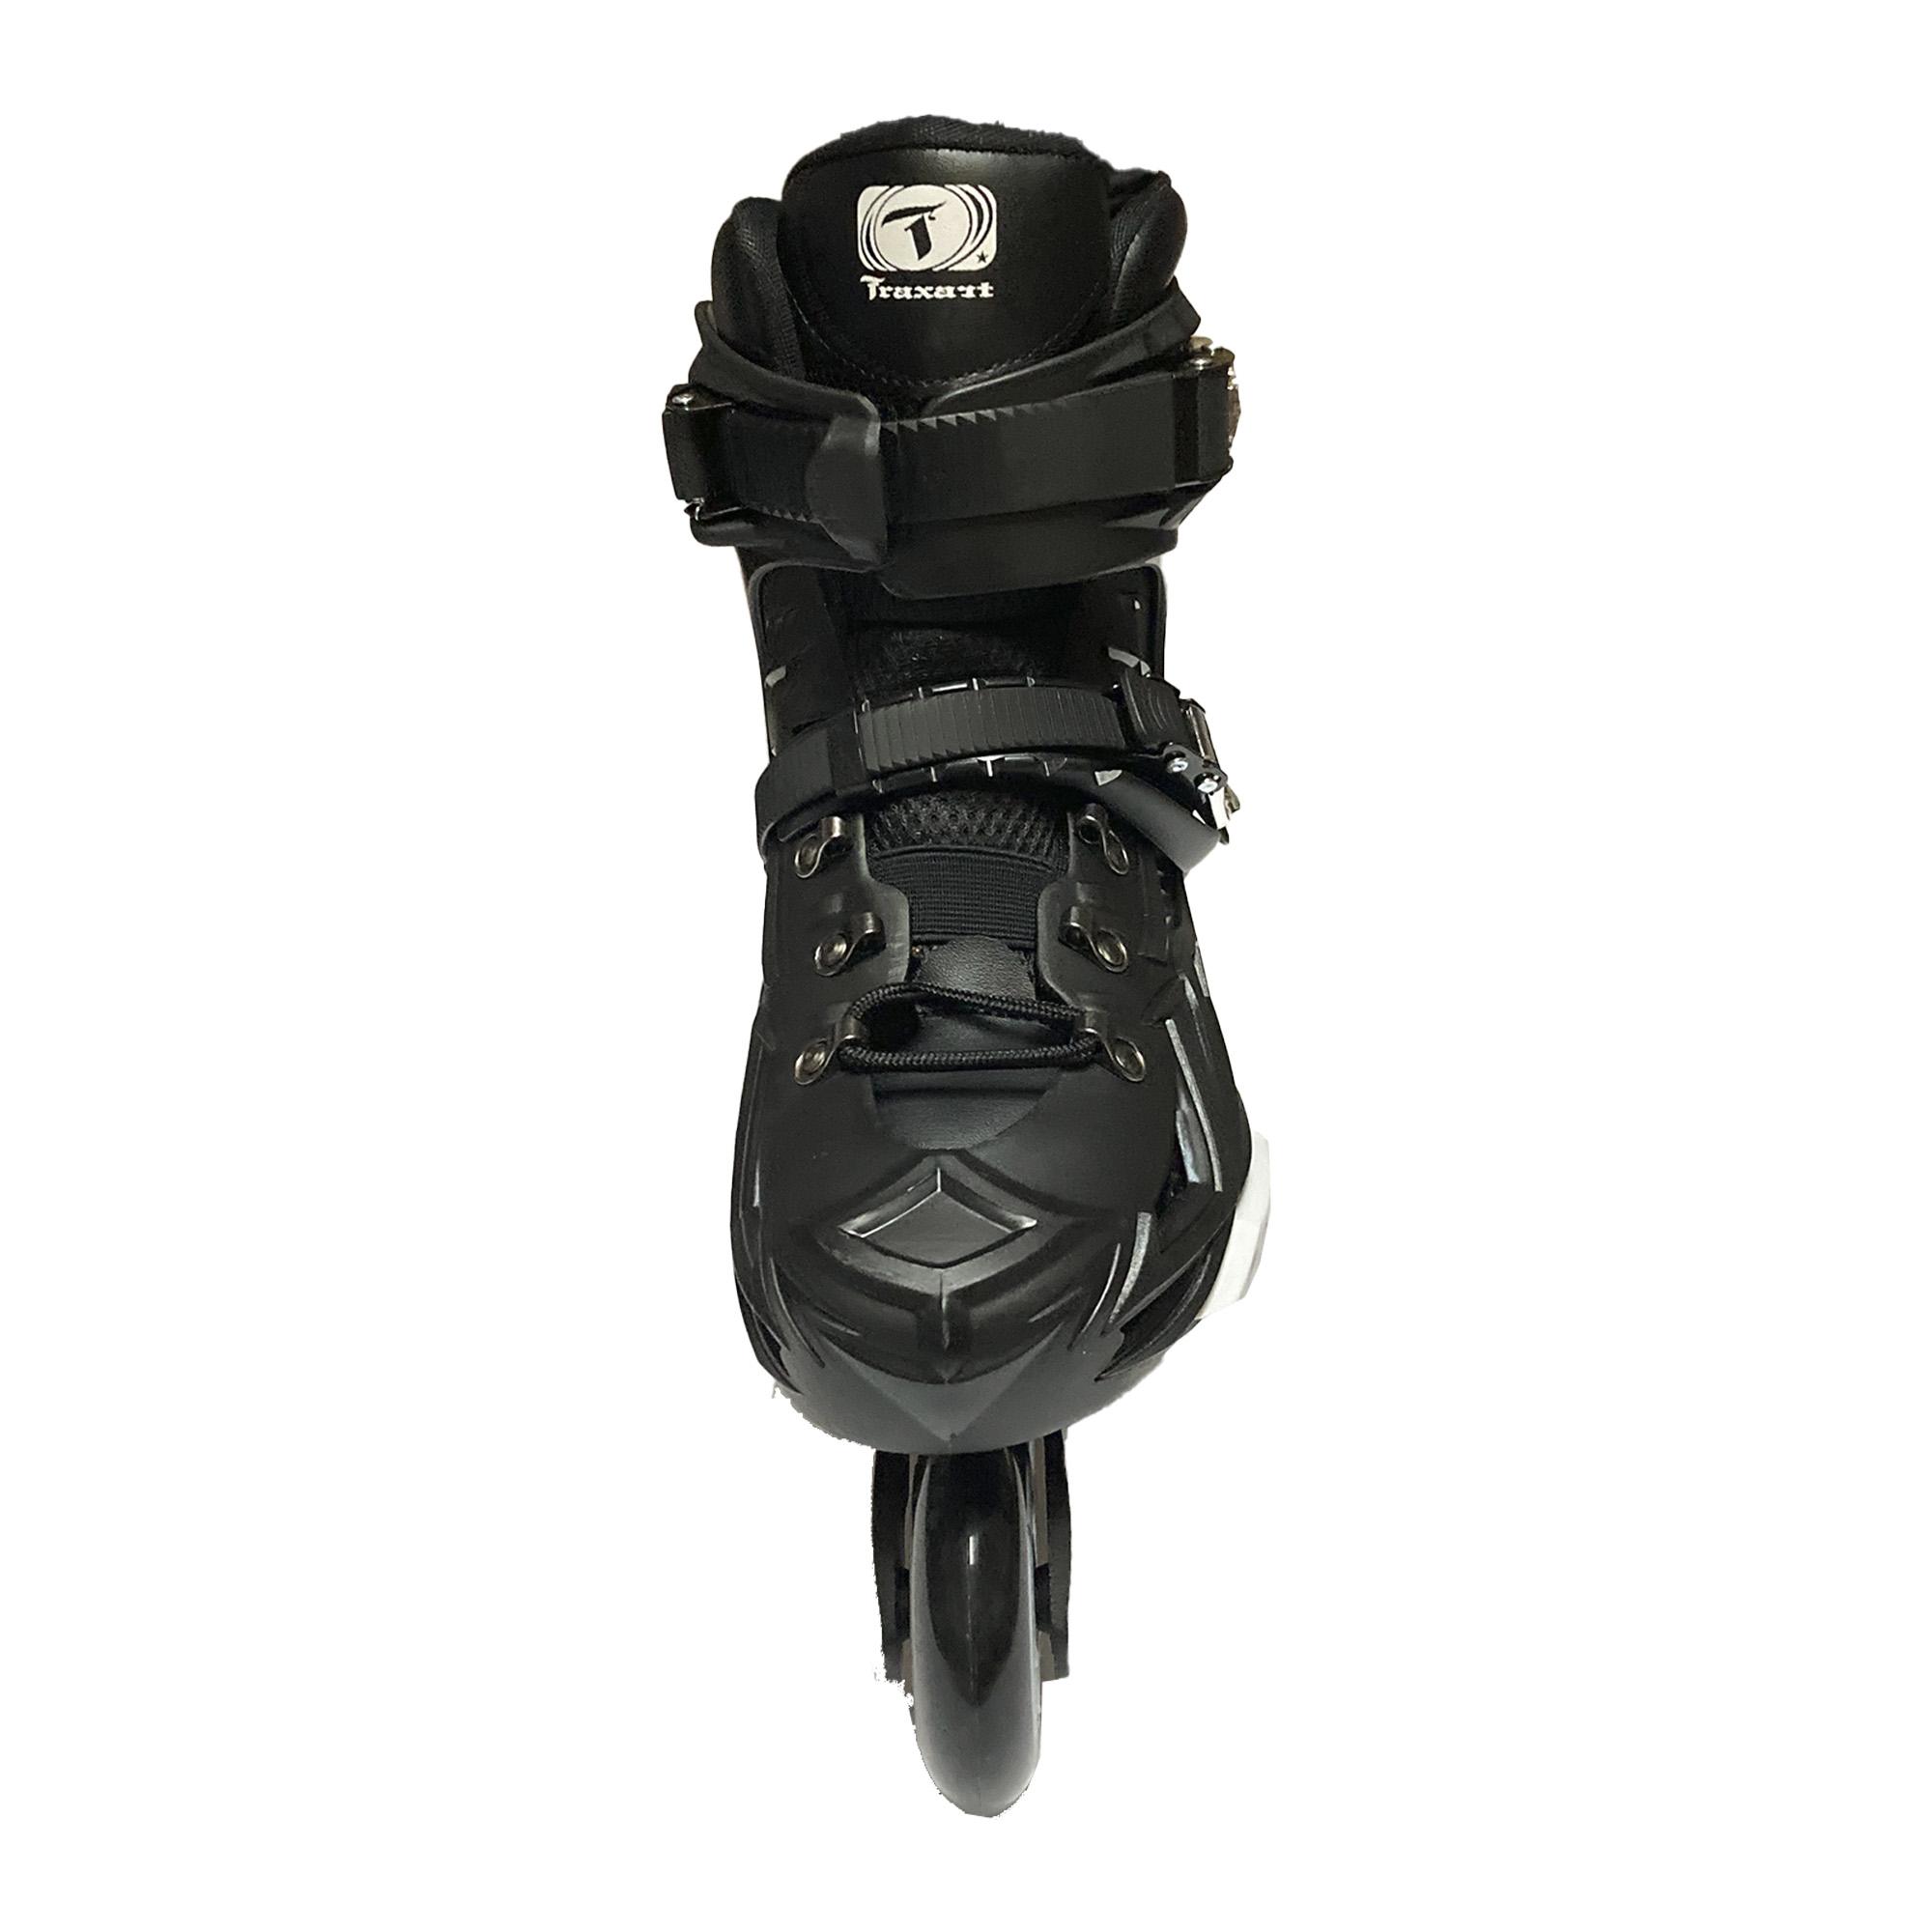 Patins Traxart Freestyle Dynamix - Rodas 80mm ABEC-7